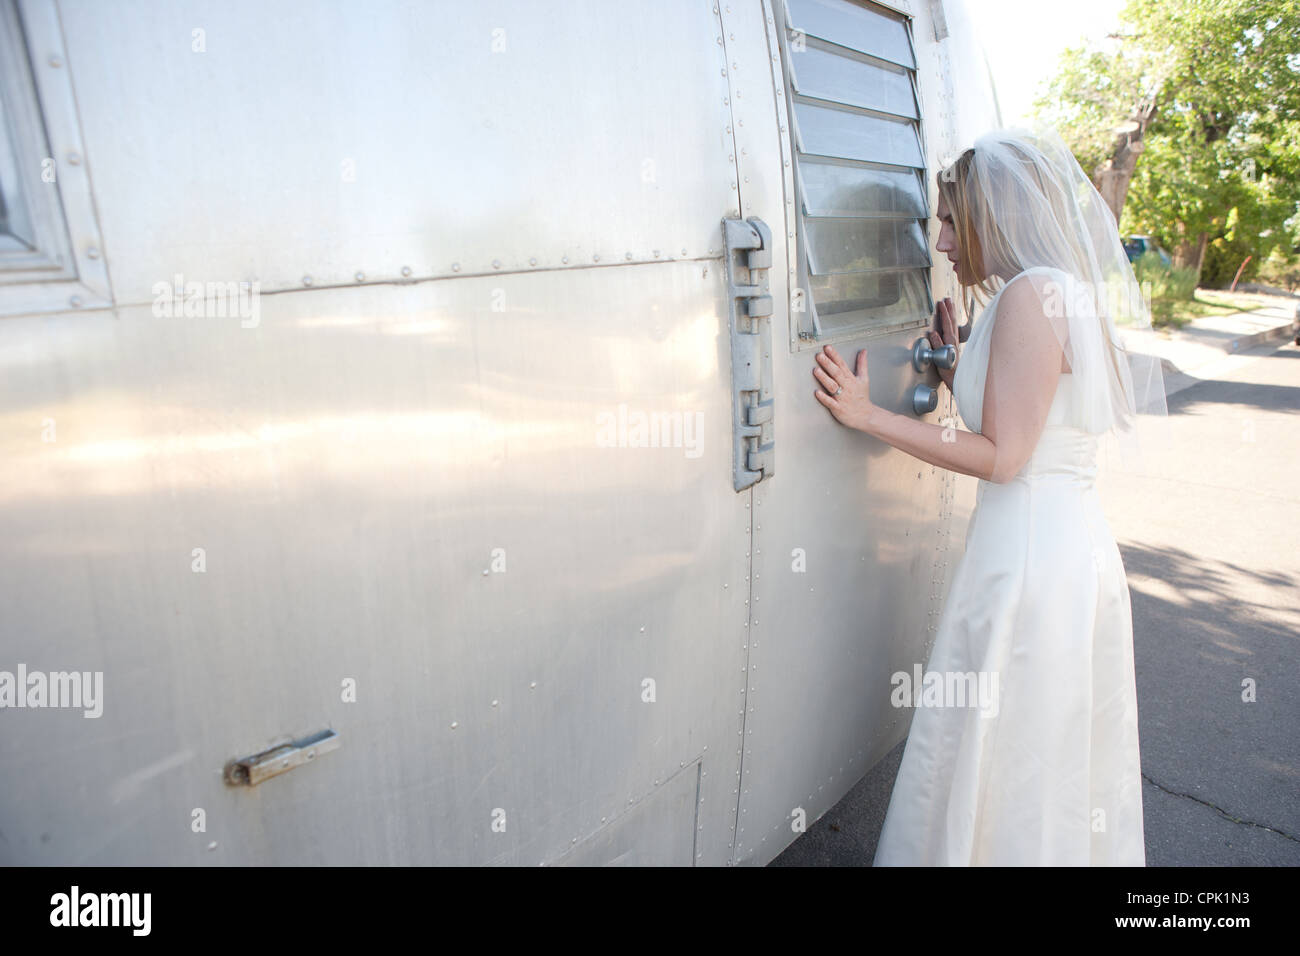 Wedding Look Stockfotos & Wedding Look Bilder - Alamy